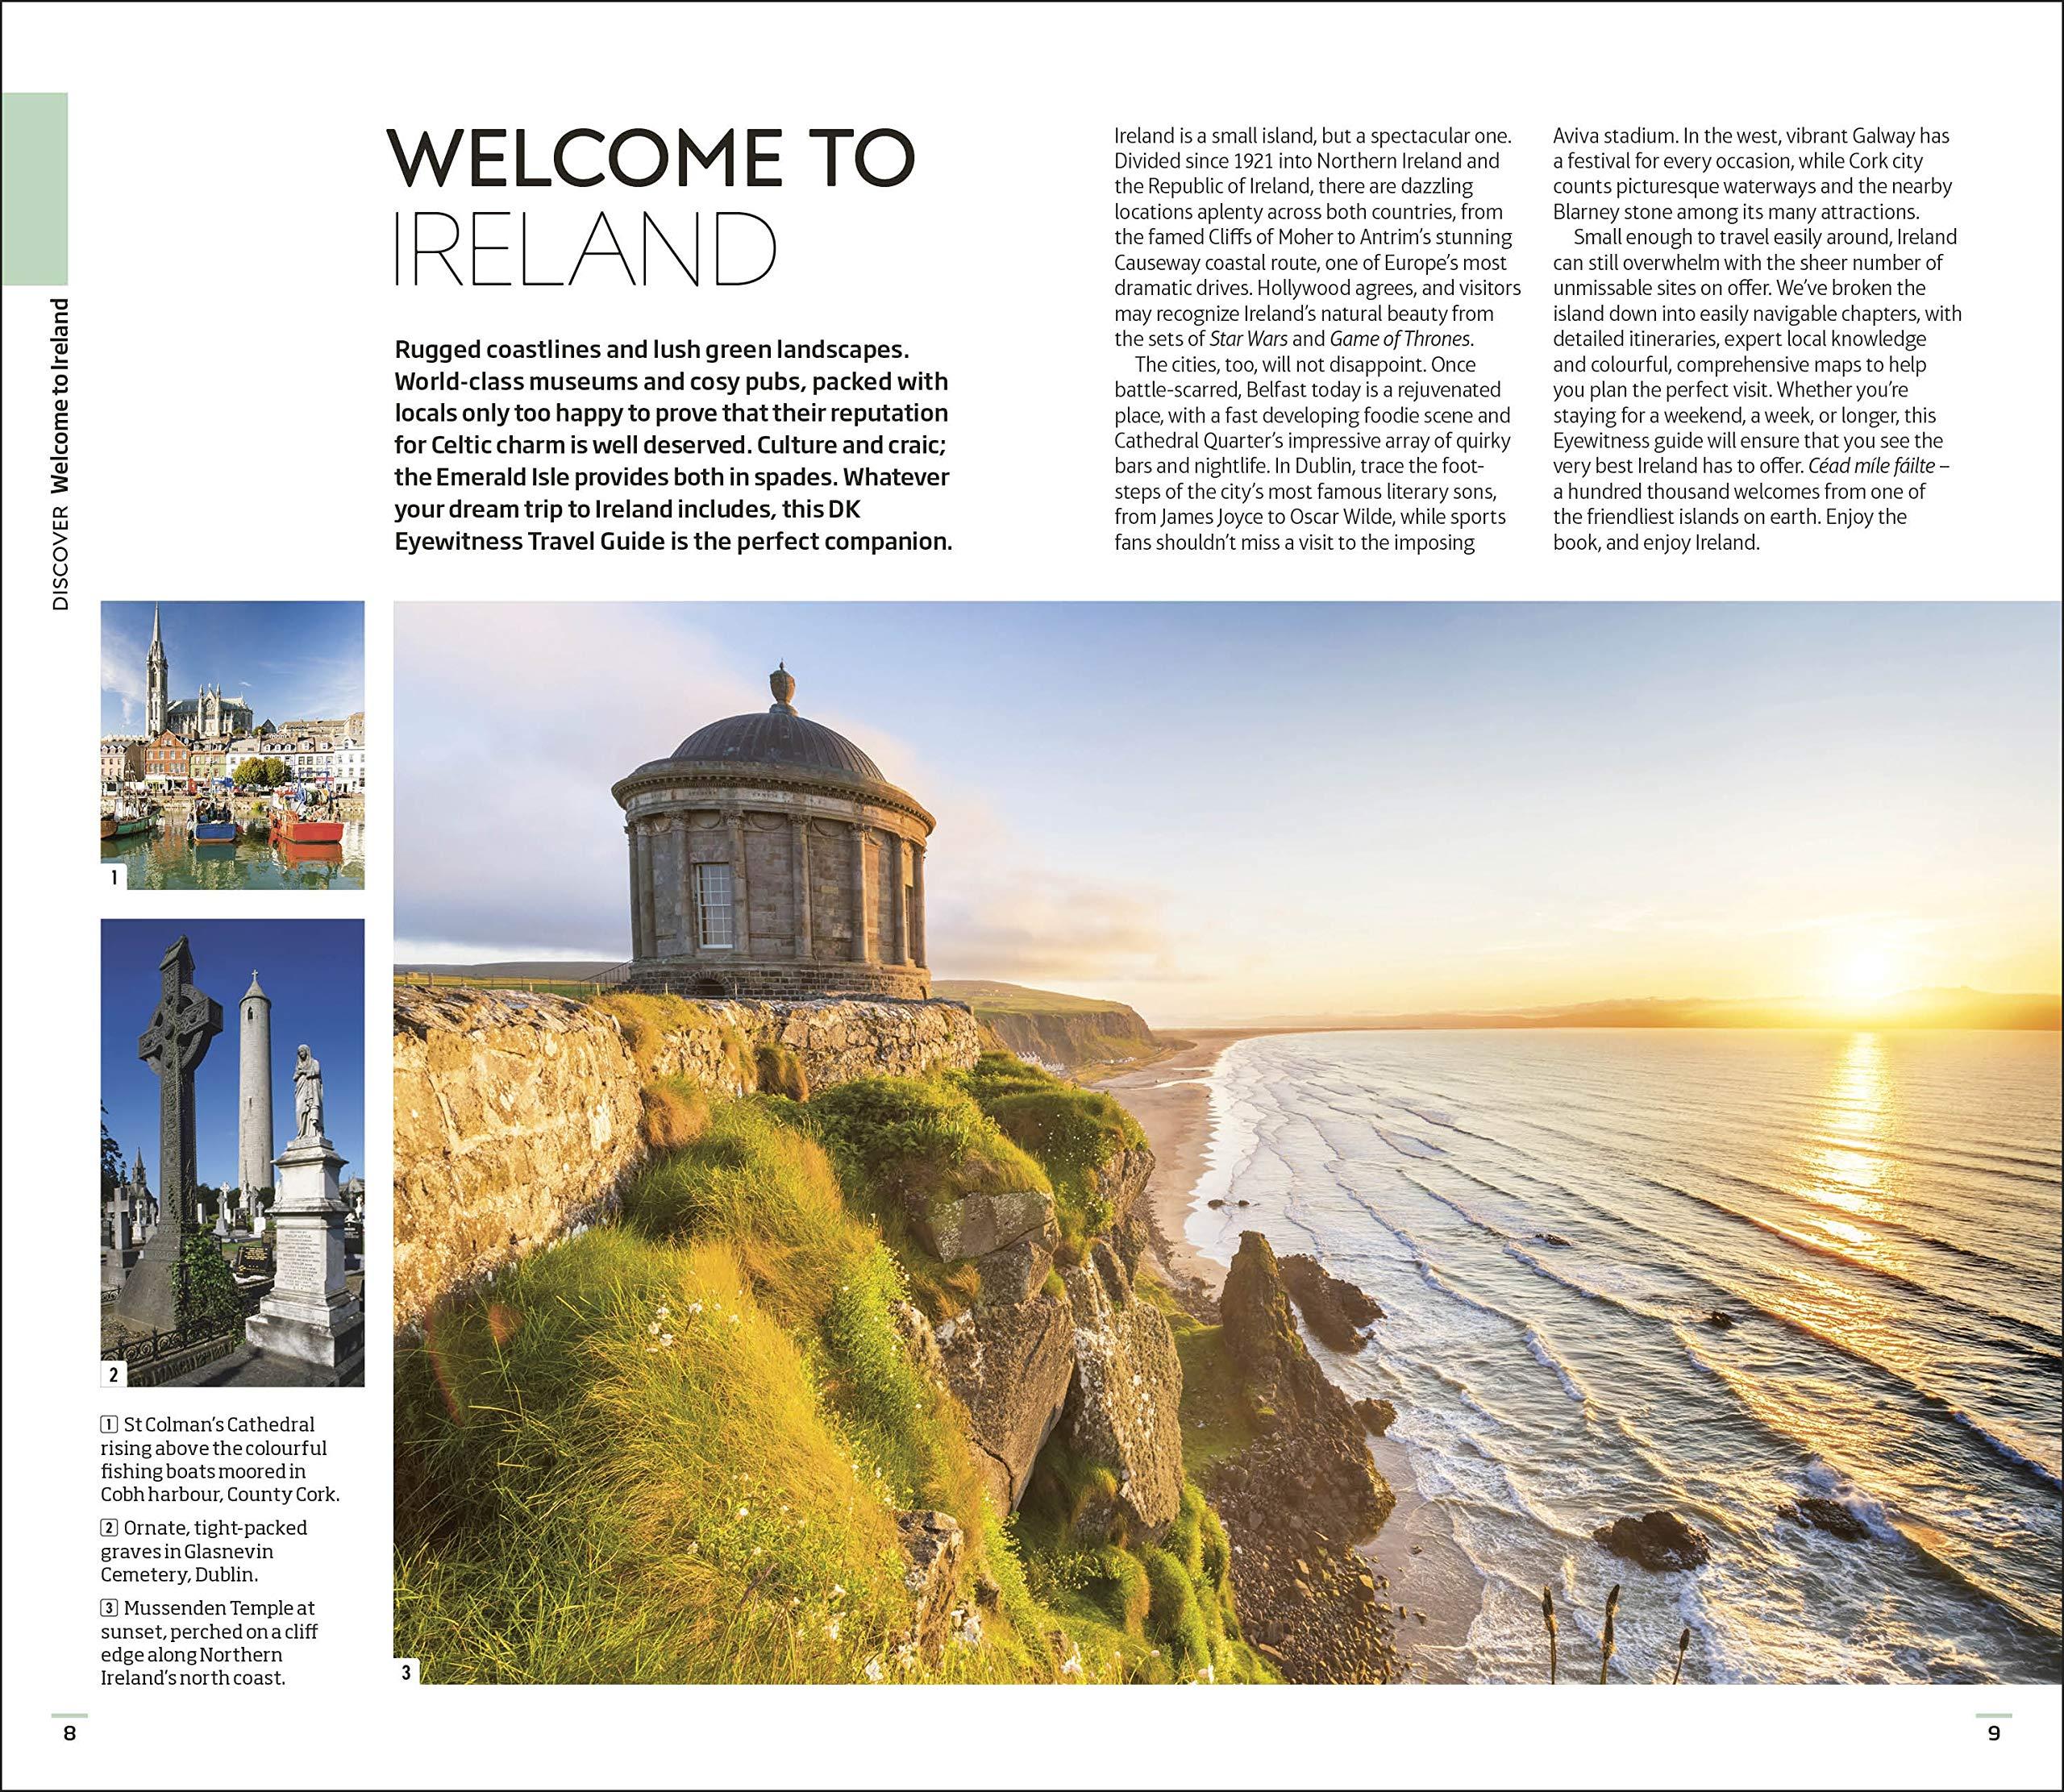 DK Eyewitness Travel Guide Ireland: 2019: DK Travel (author):  9780241311813: Amazon.com: Books